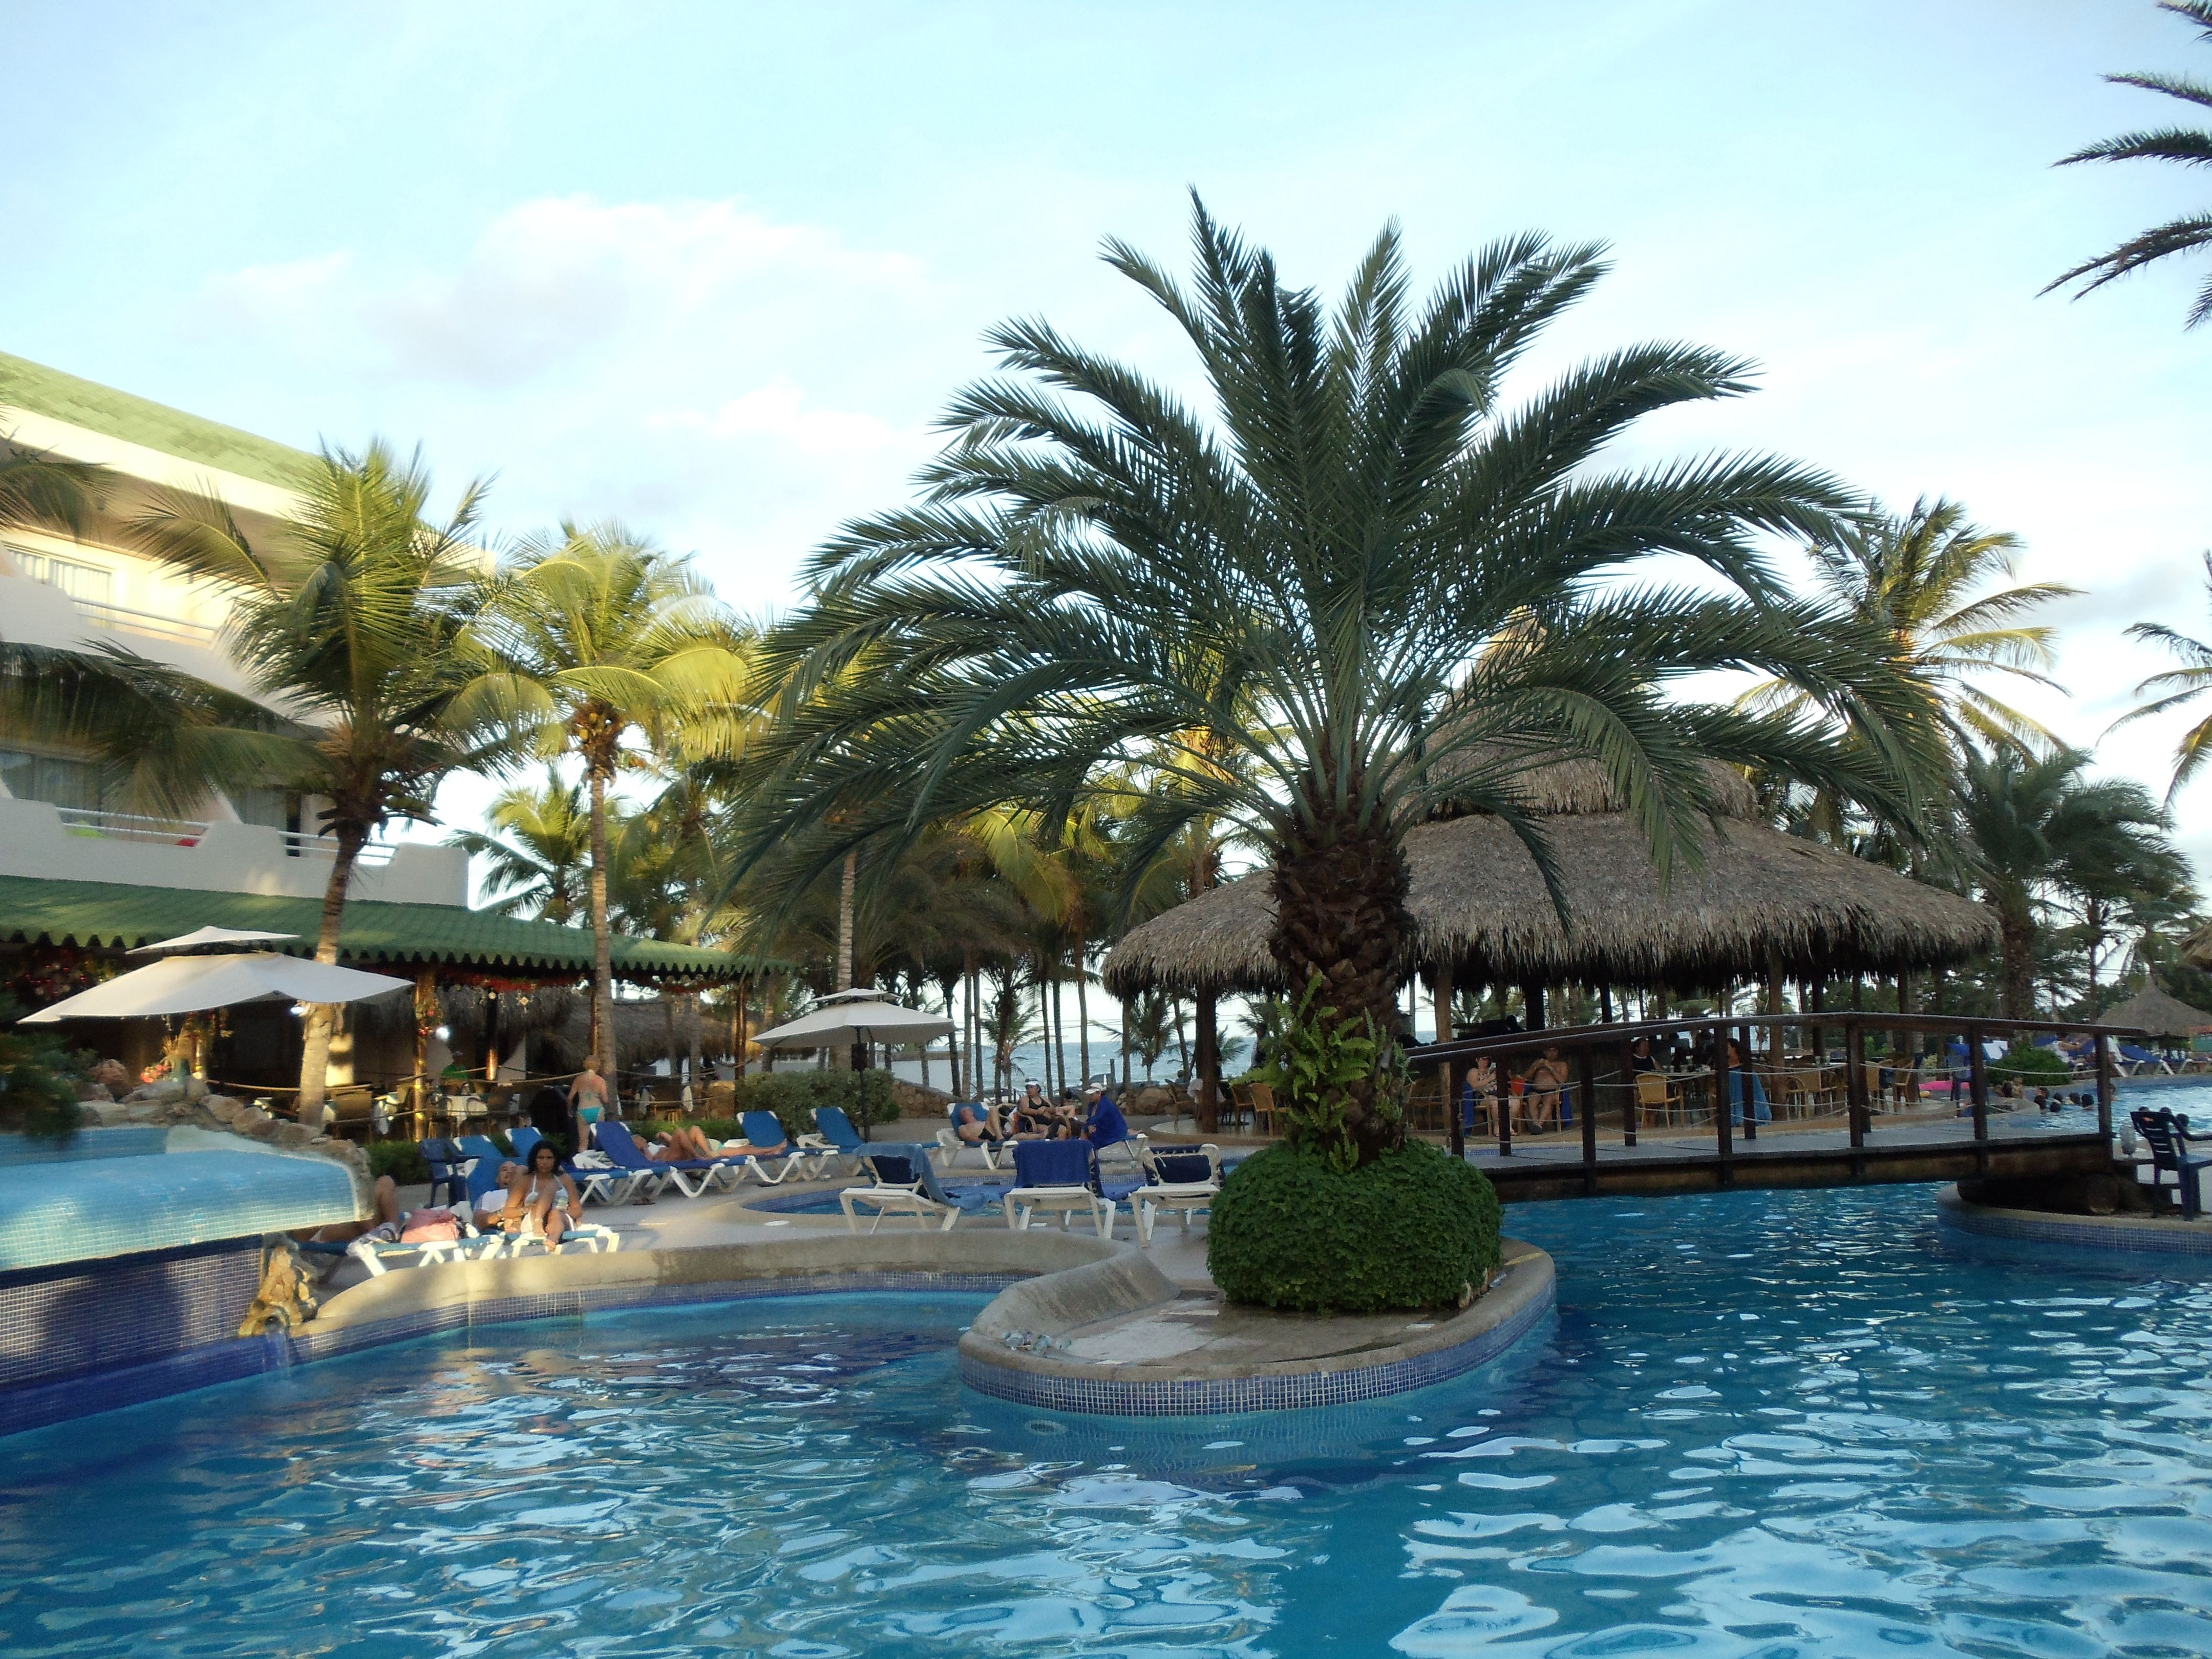 Sunsol Hoteles Isla Caribe Playa El Cardón Isla De Margarita Venezuela Isla Margarita Mansions Isla